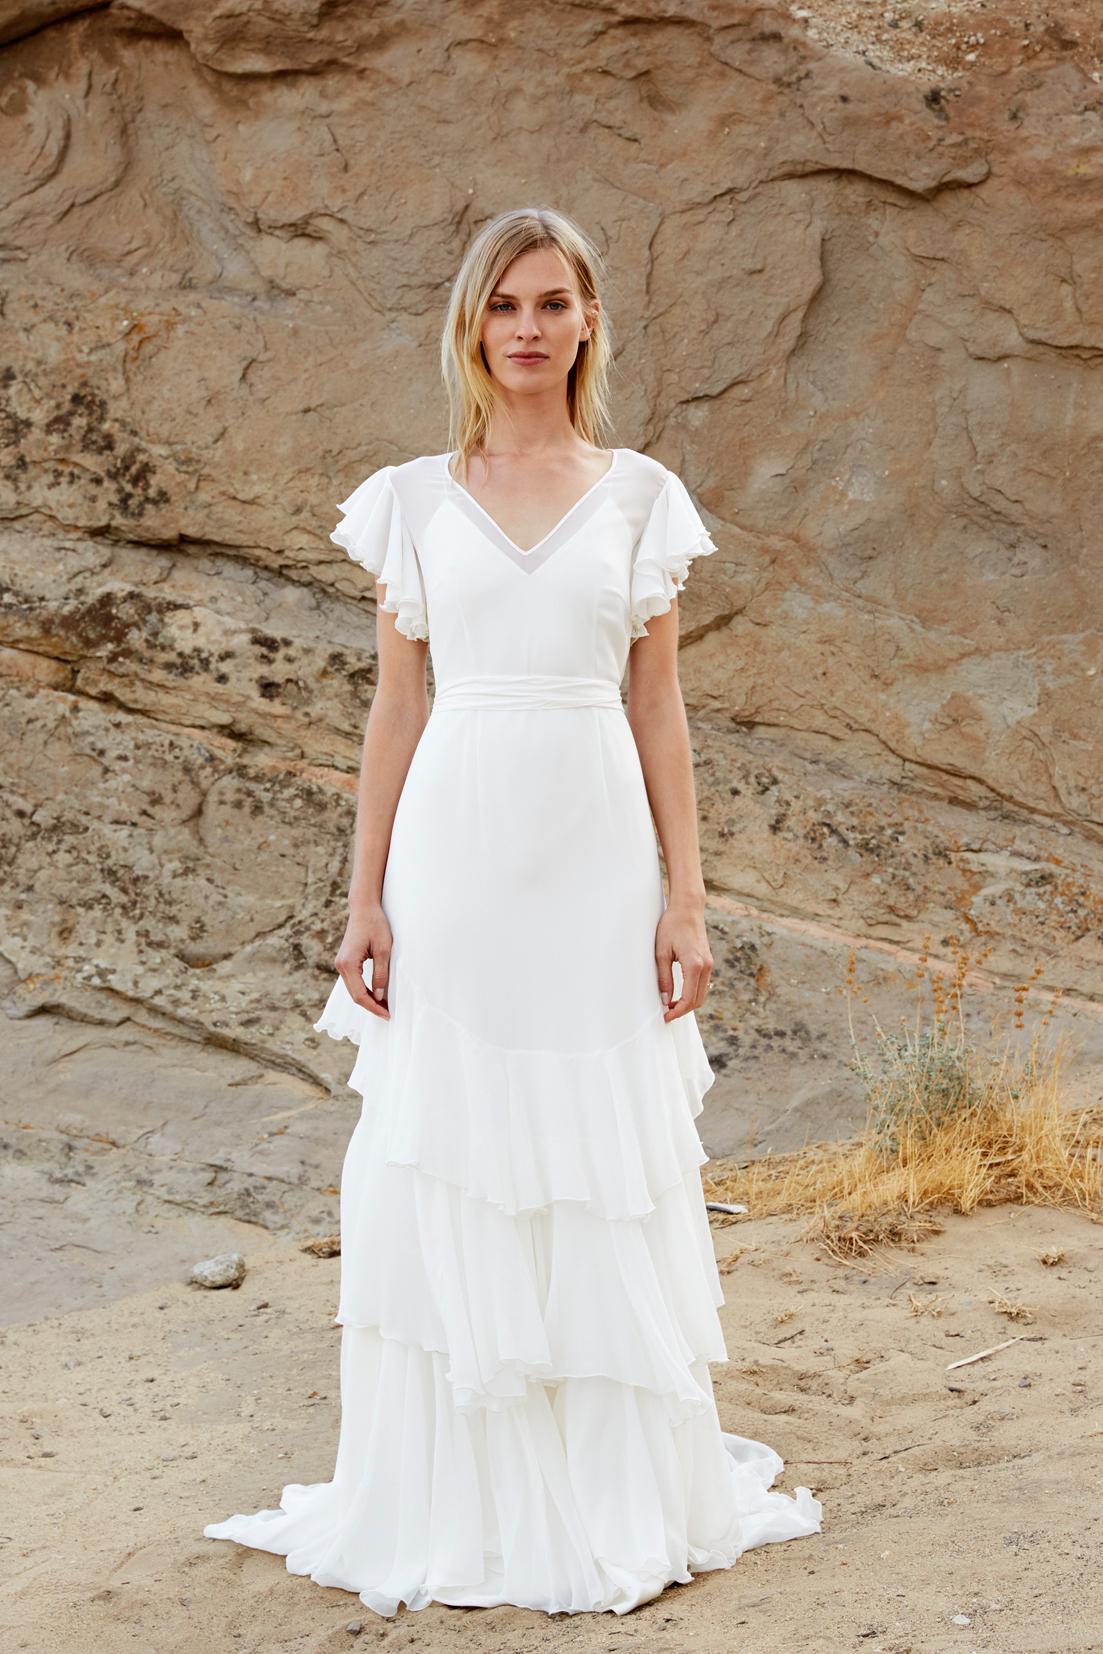 savannah miller fall 2018 v-neck flutter sleeve wedding dress